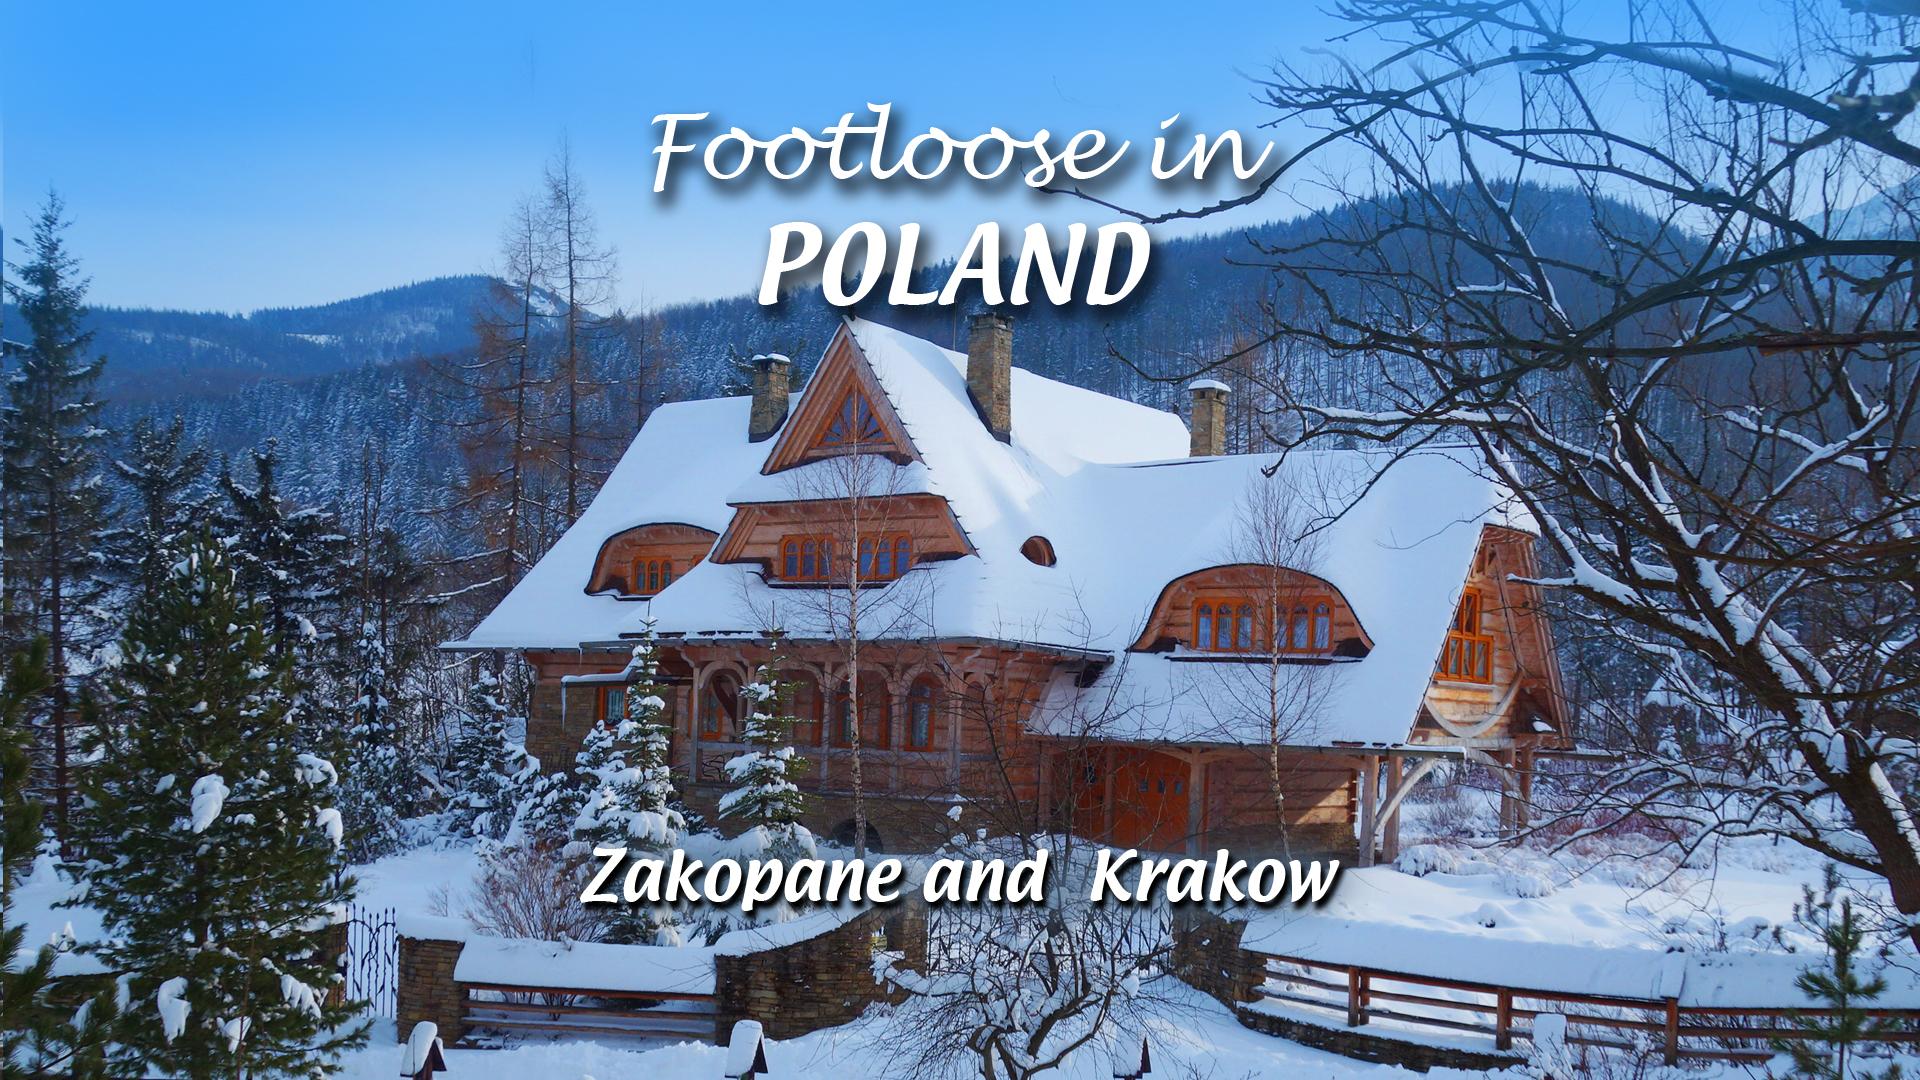 Footloose in Poland - Zakopane and Krakow